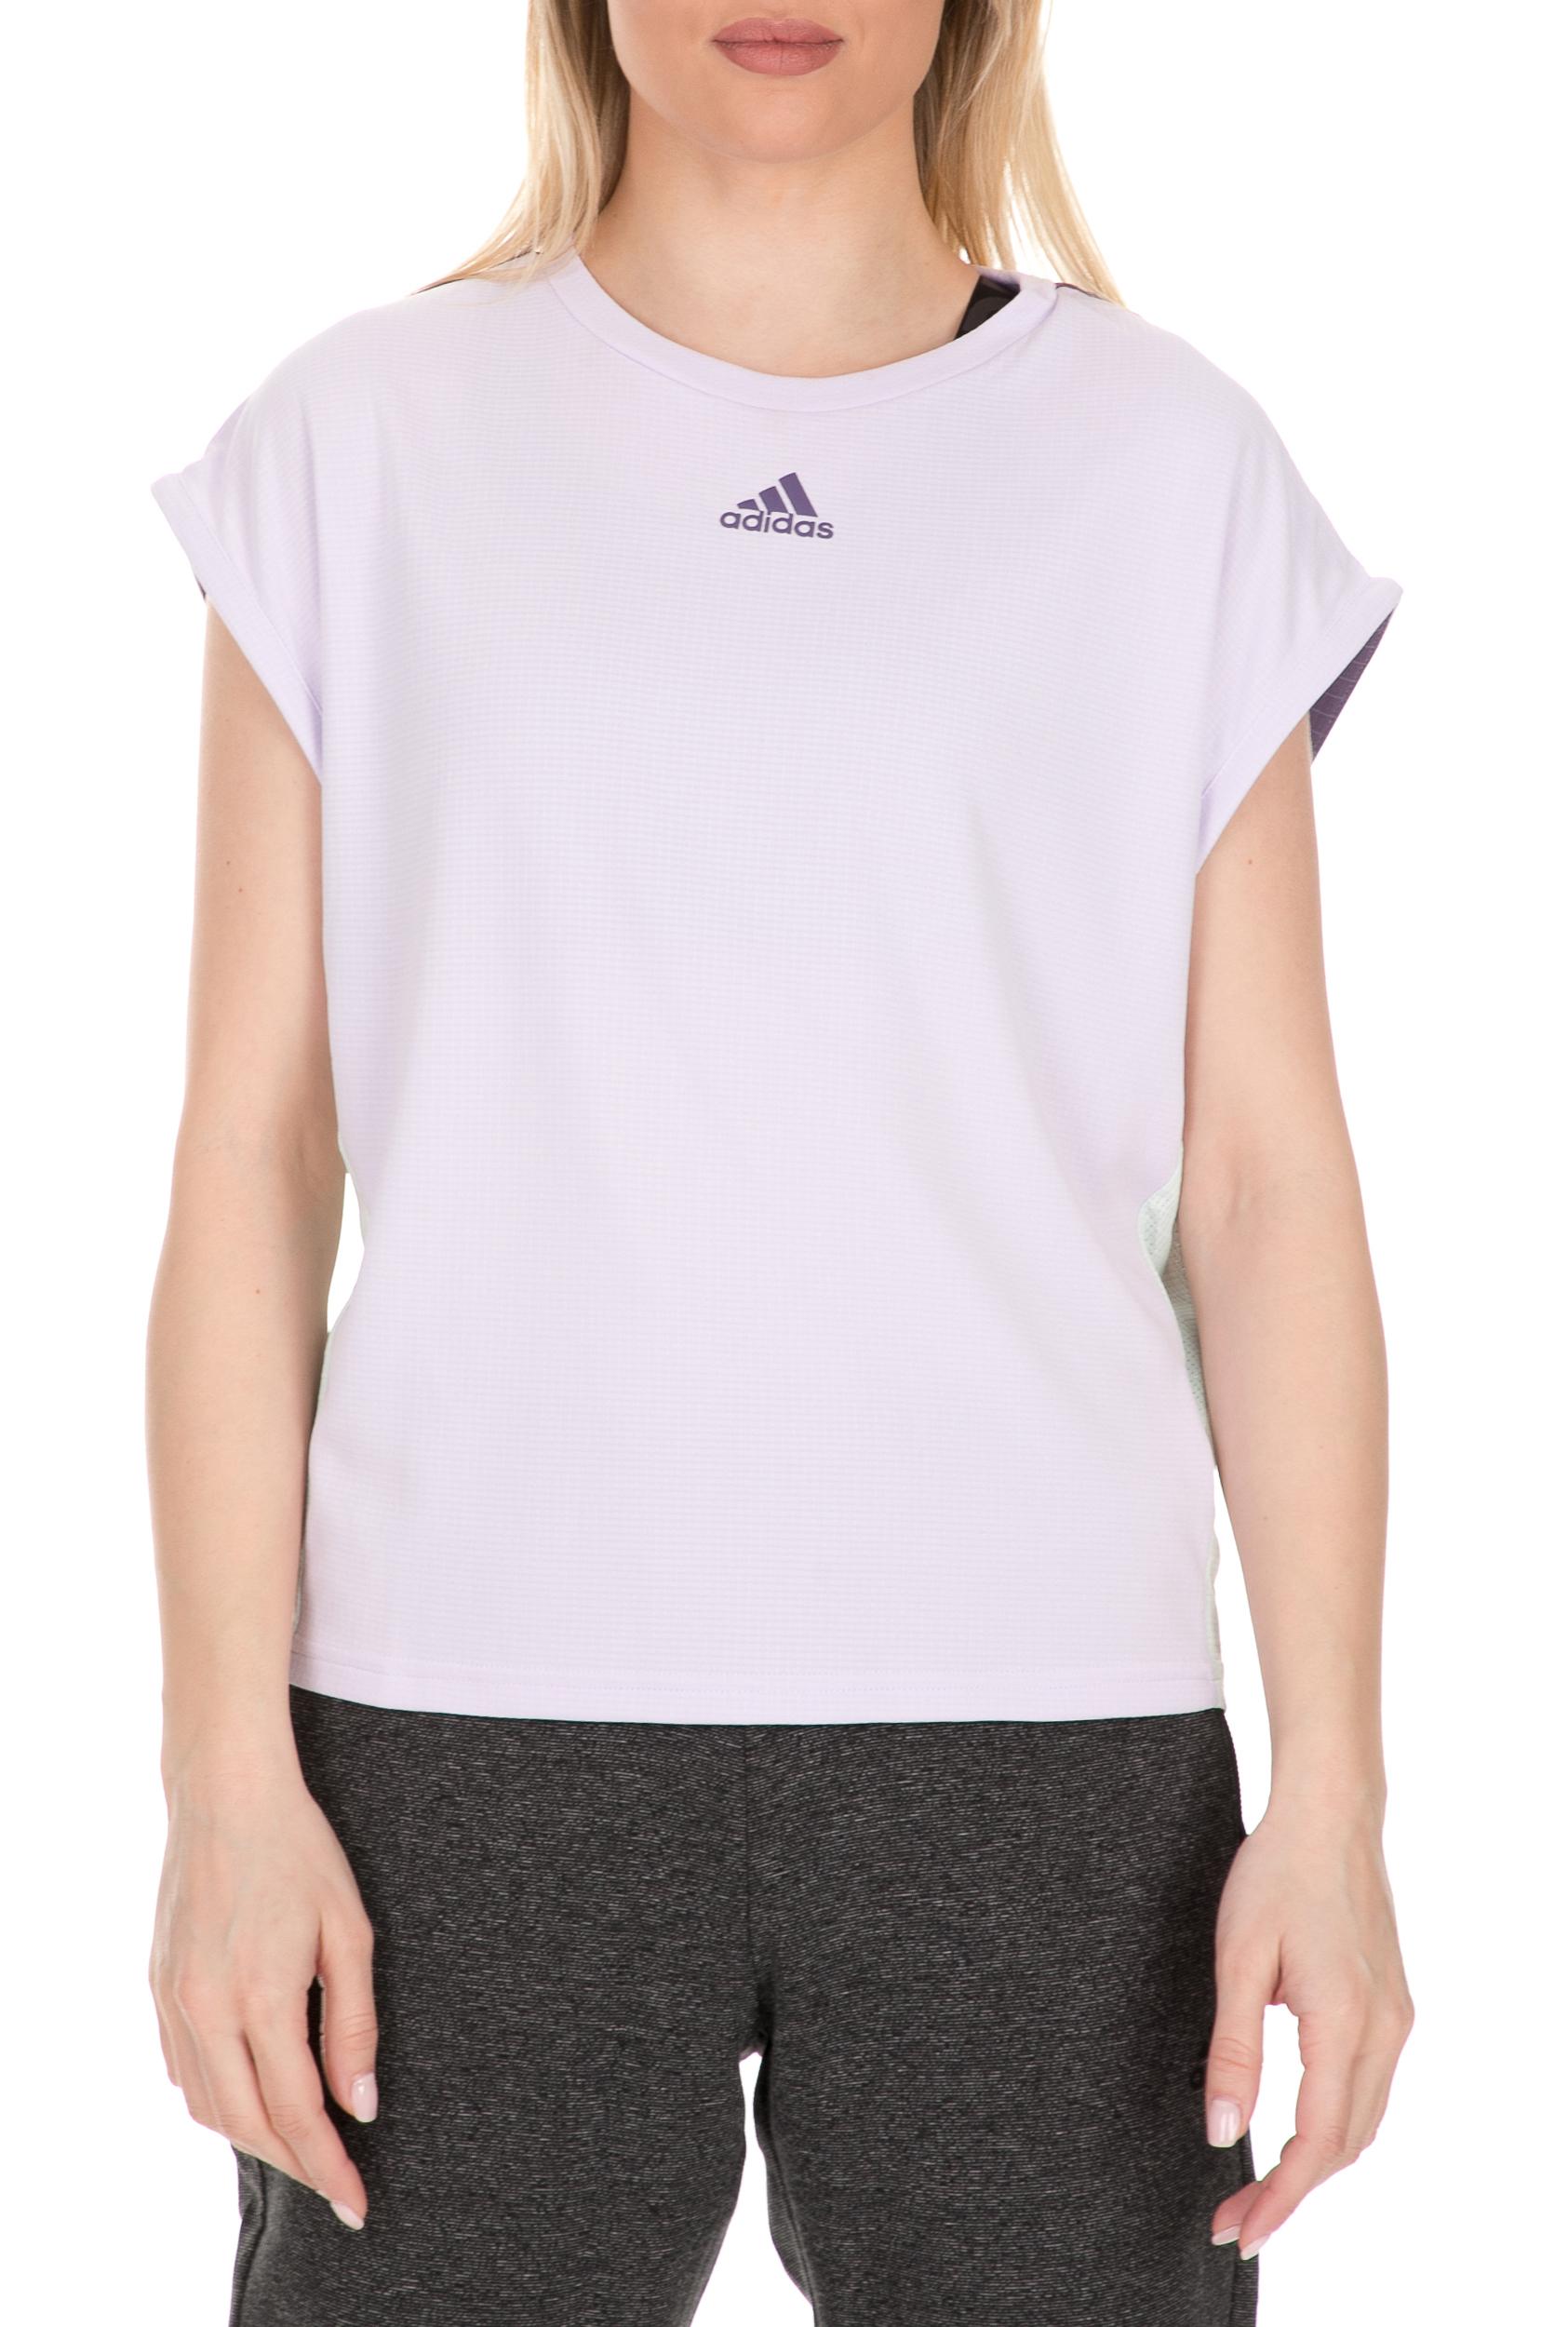 adidas Performance - Γυναικεία τένις μπλούζα adidas HEAT.RDY μοβ